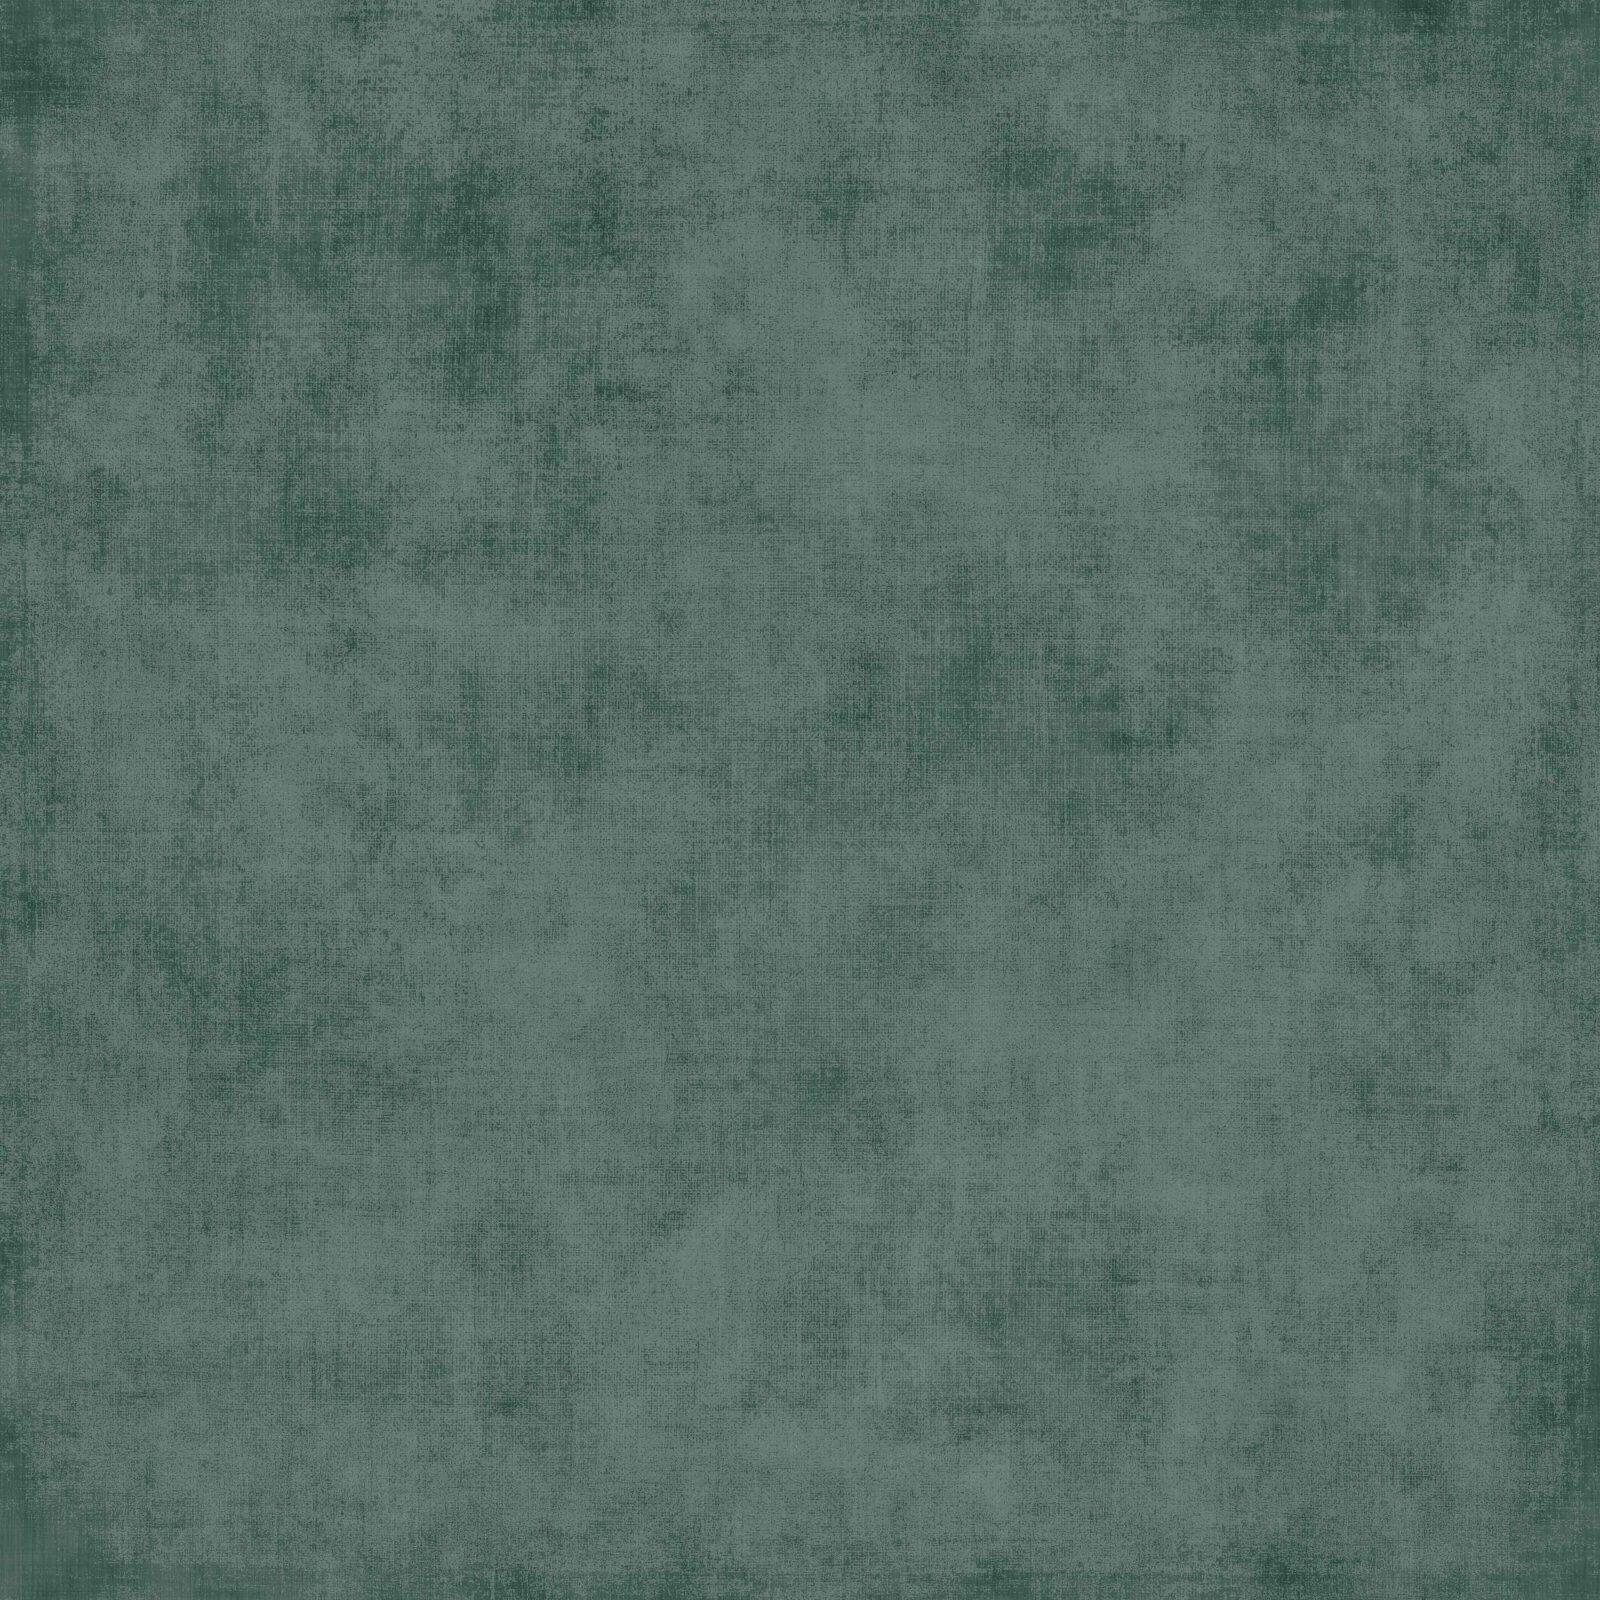 Basic Shade - Bluespruce Fabric